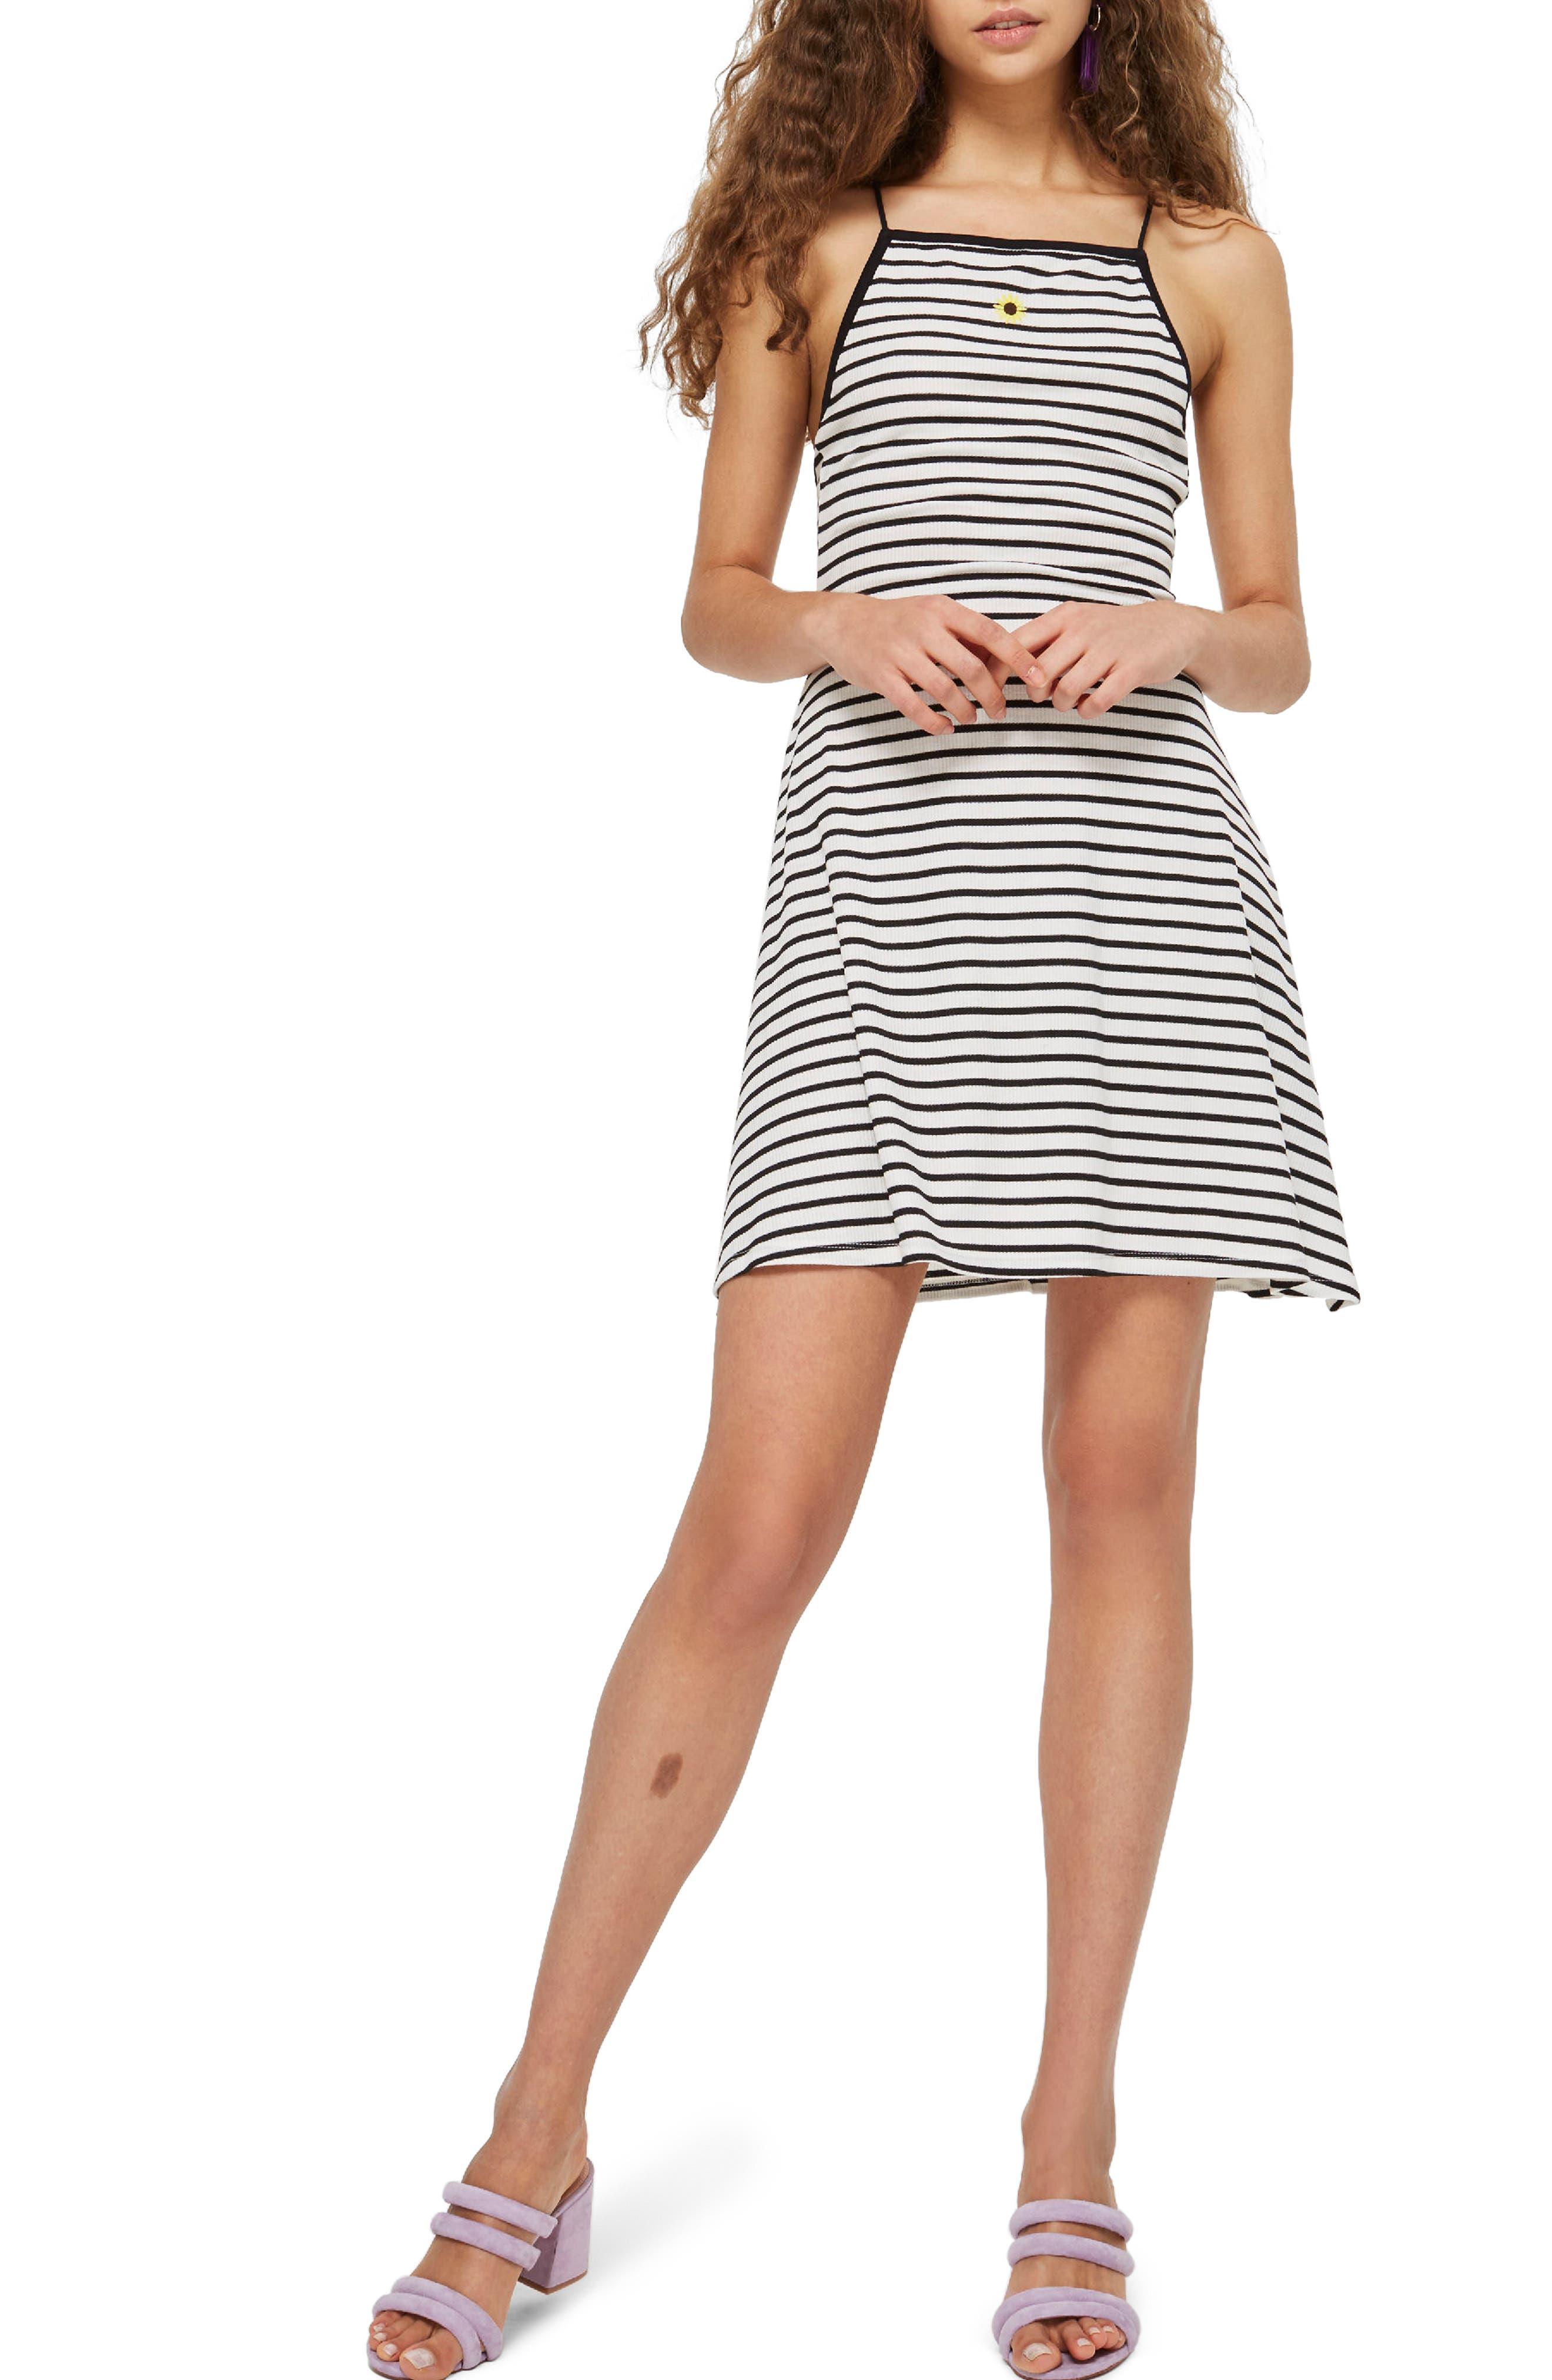 Stripe Skater Dress,                             Main thumbnail 1, color,                             White Multi